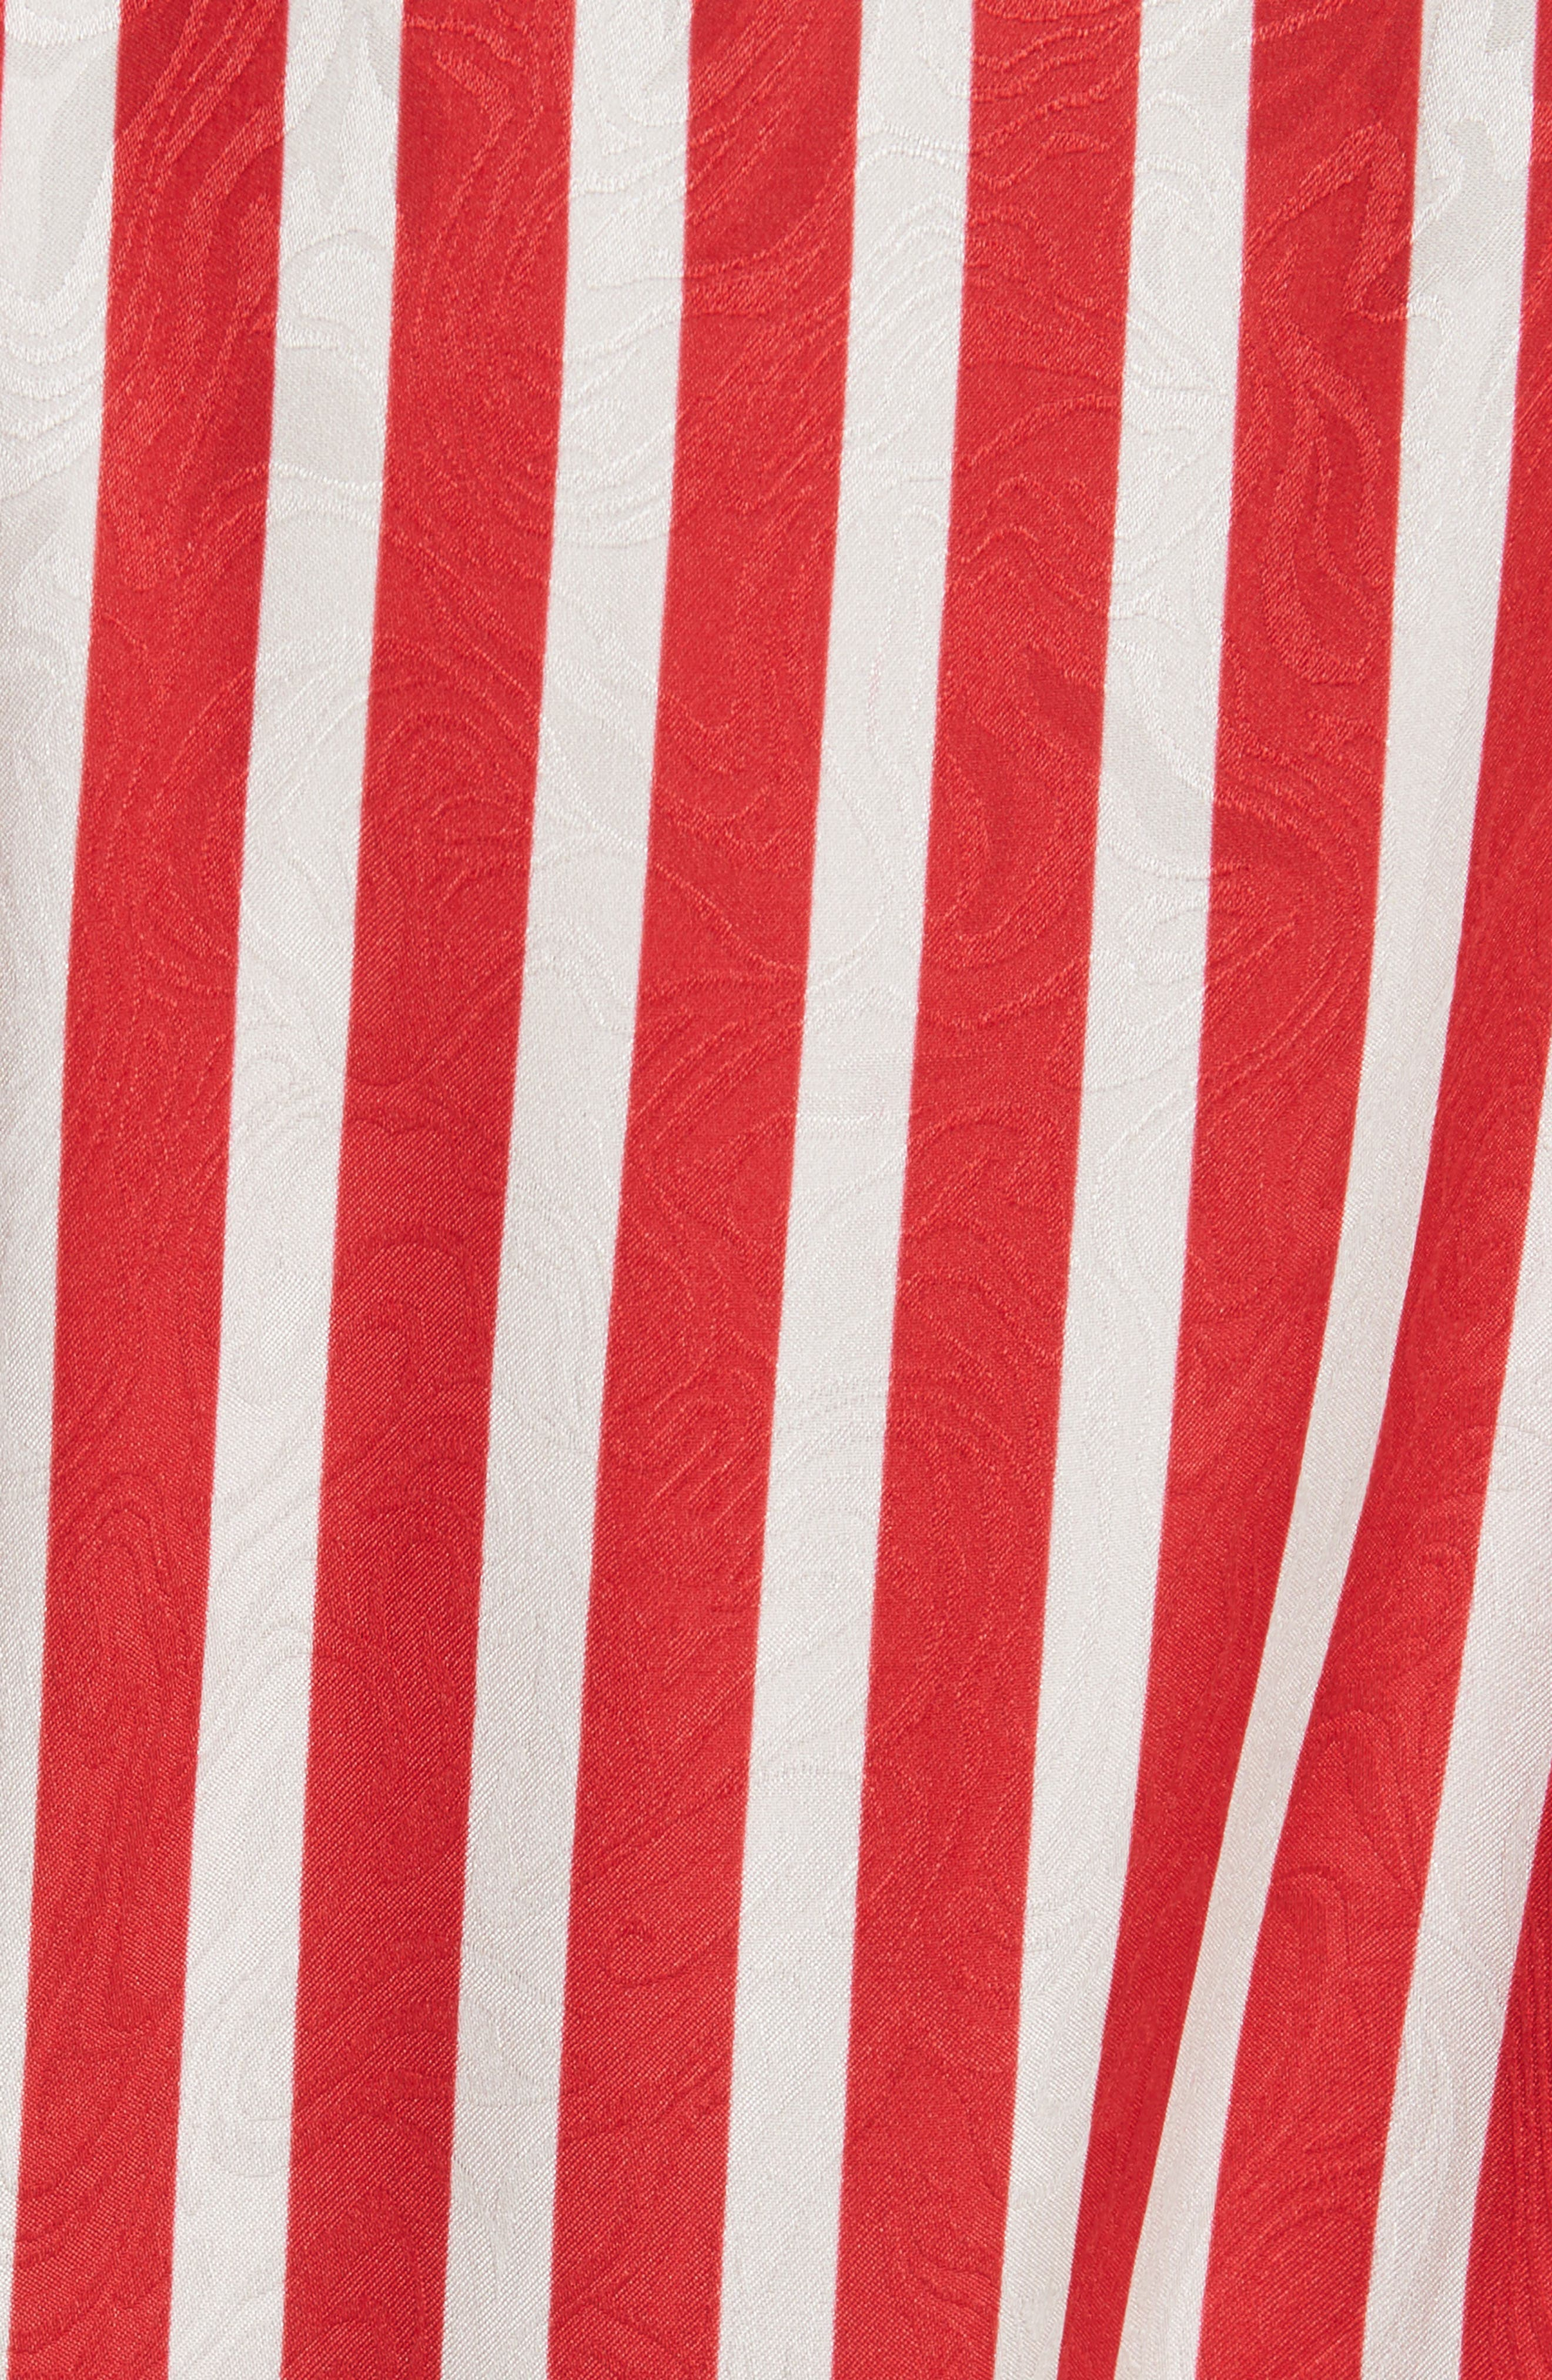 STELLA MCCARTNEY,                             Zigzag Stripe Silk Dress,                             Alternate thumbnail 5, color,                             627